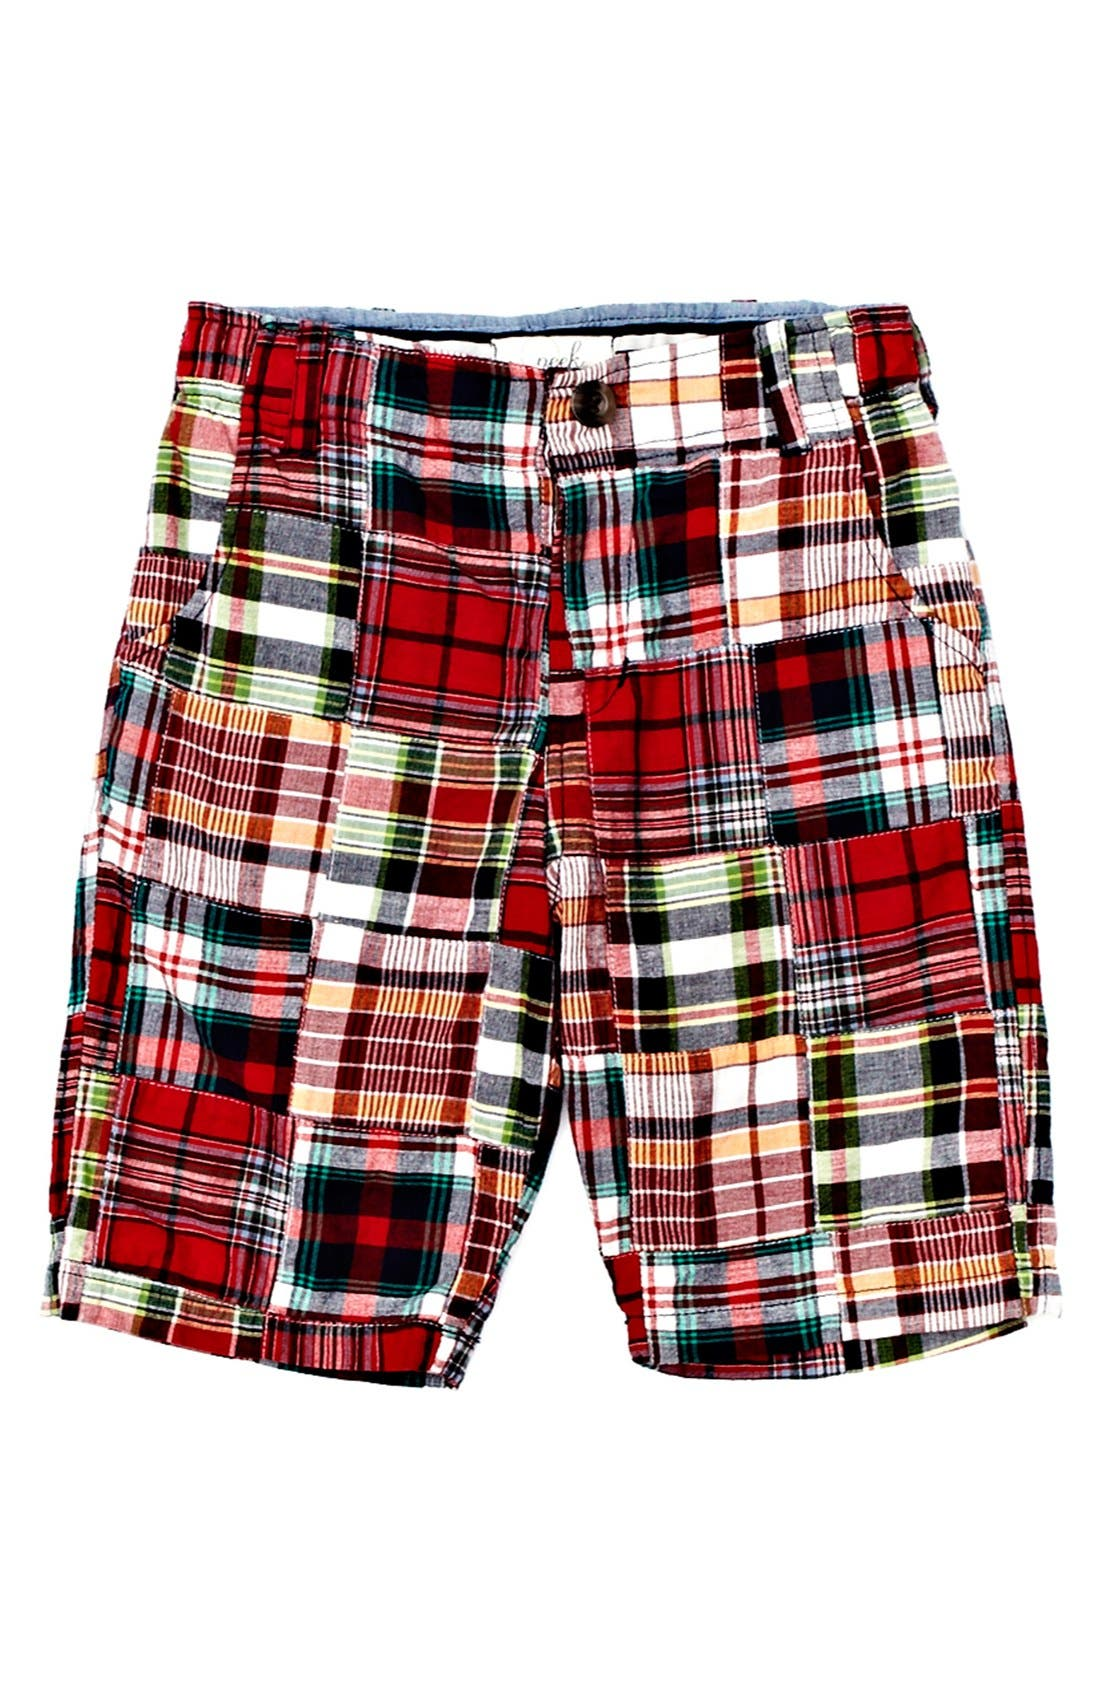 Main Image - Peek 'Hampton Patch' Plaid Shorts (Toddler Boys, Little Boys & Big Boys)